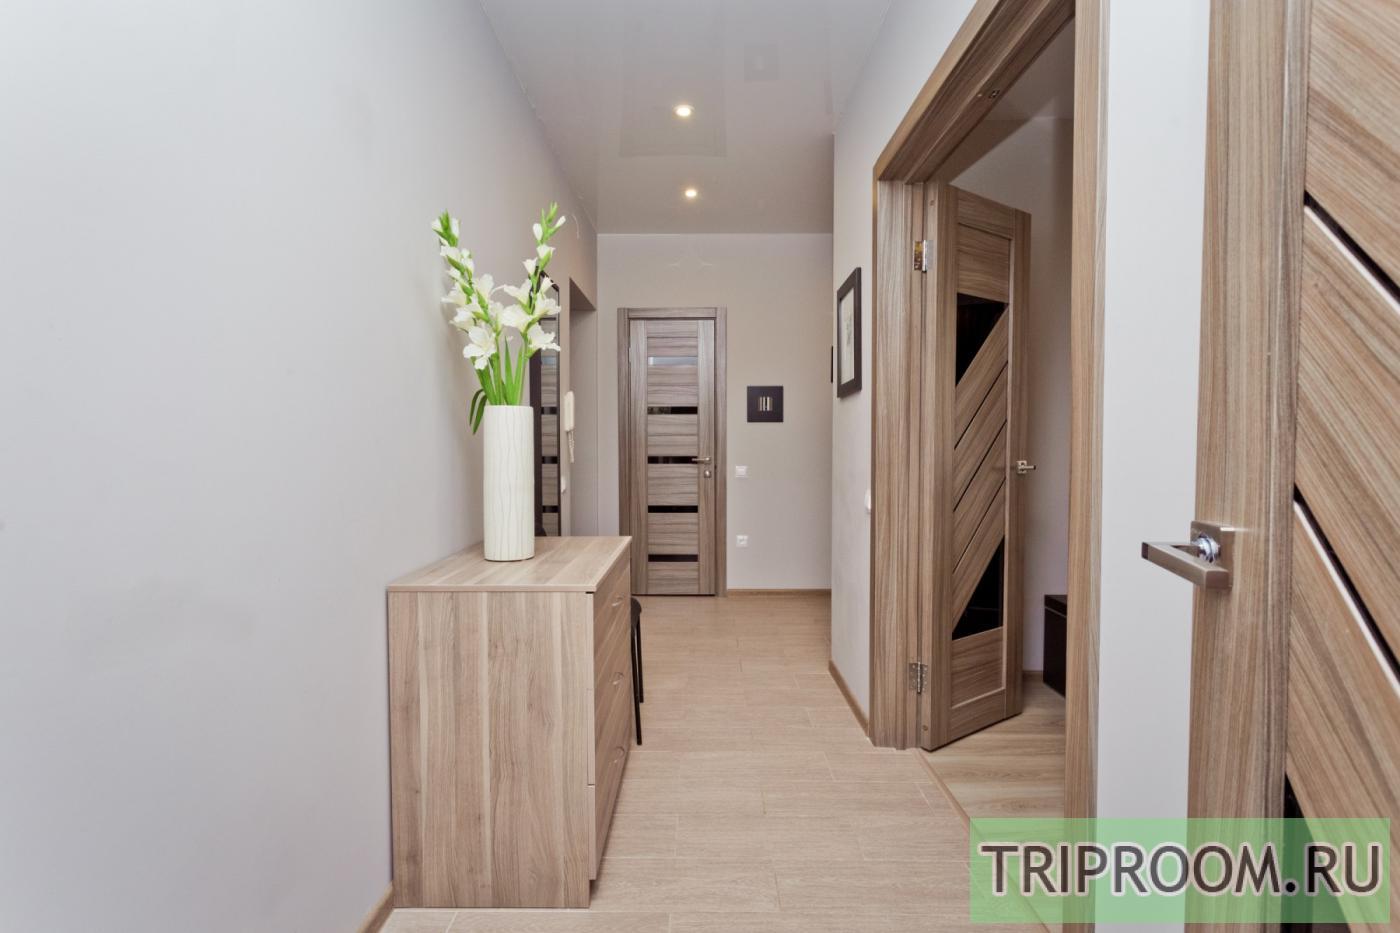 2-комнатная квартира посуточно (вариант № 26145), ул. Звездинка улица, фото № 8